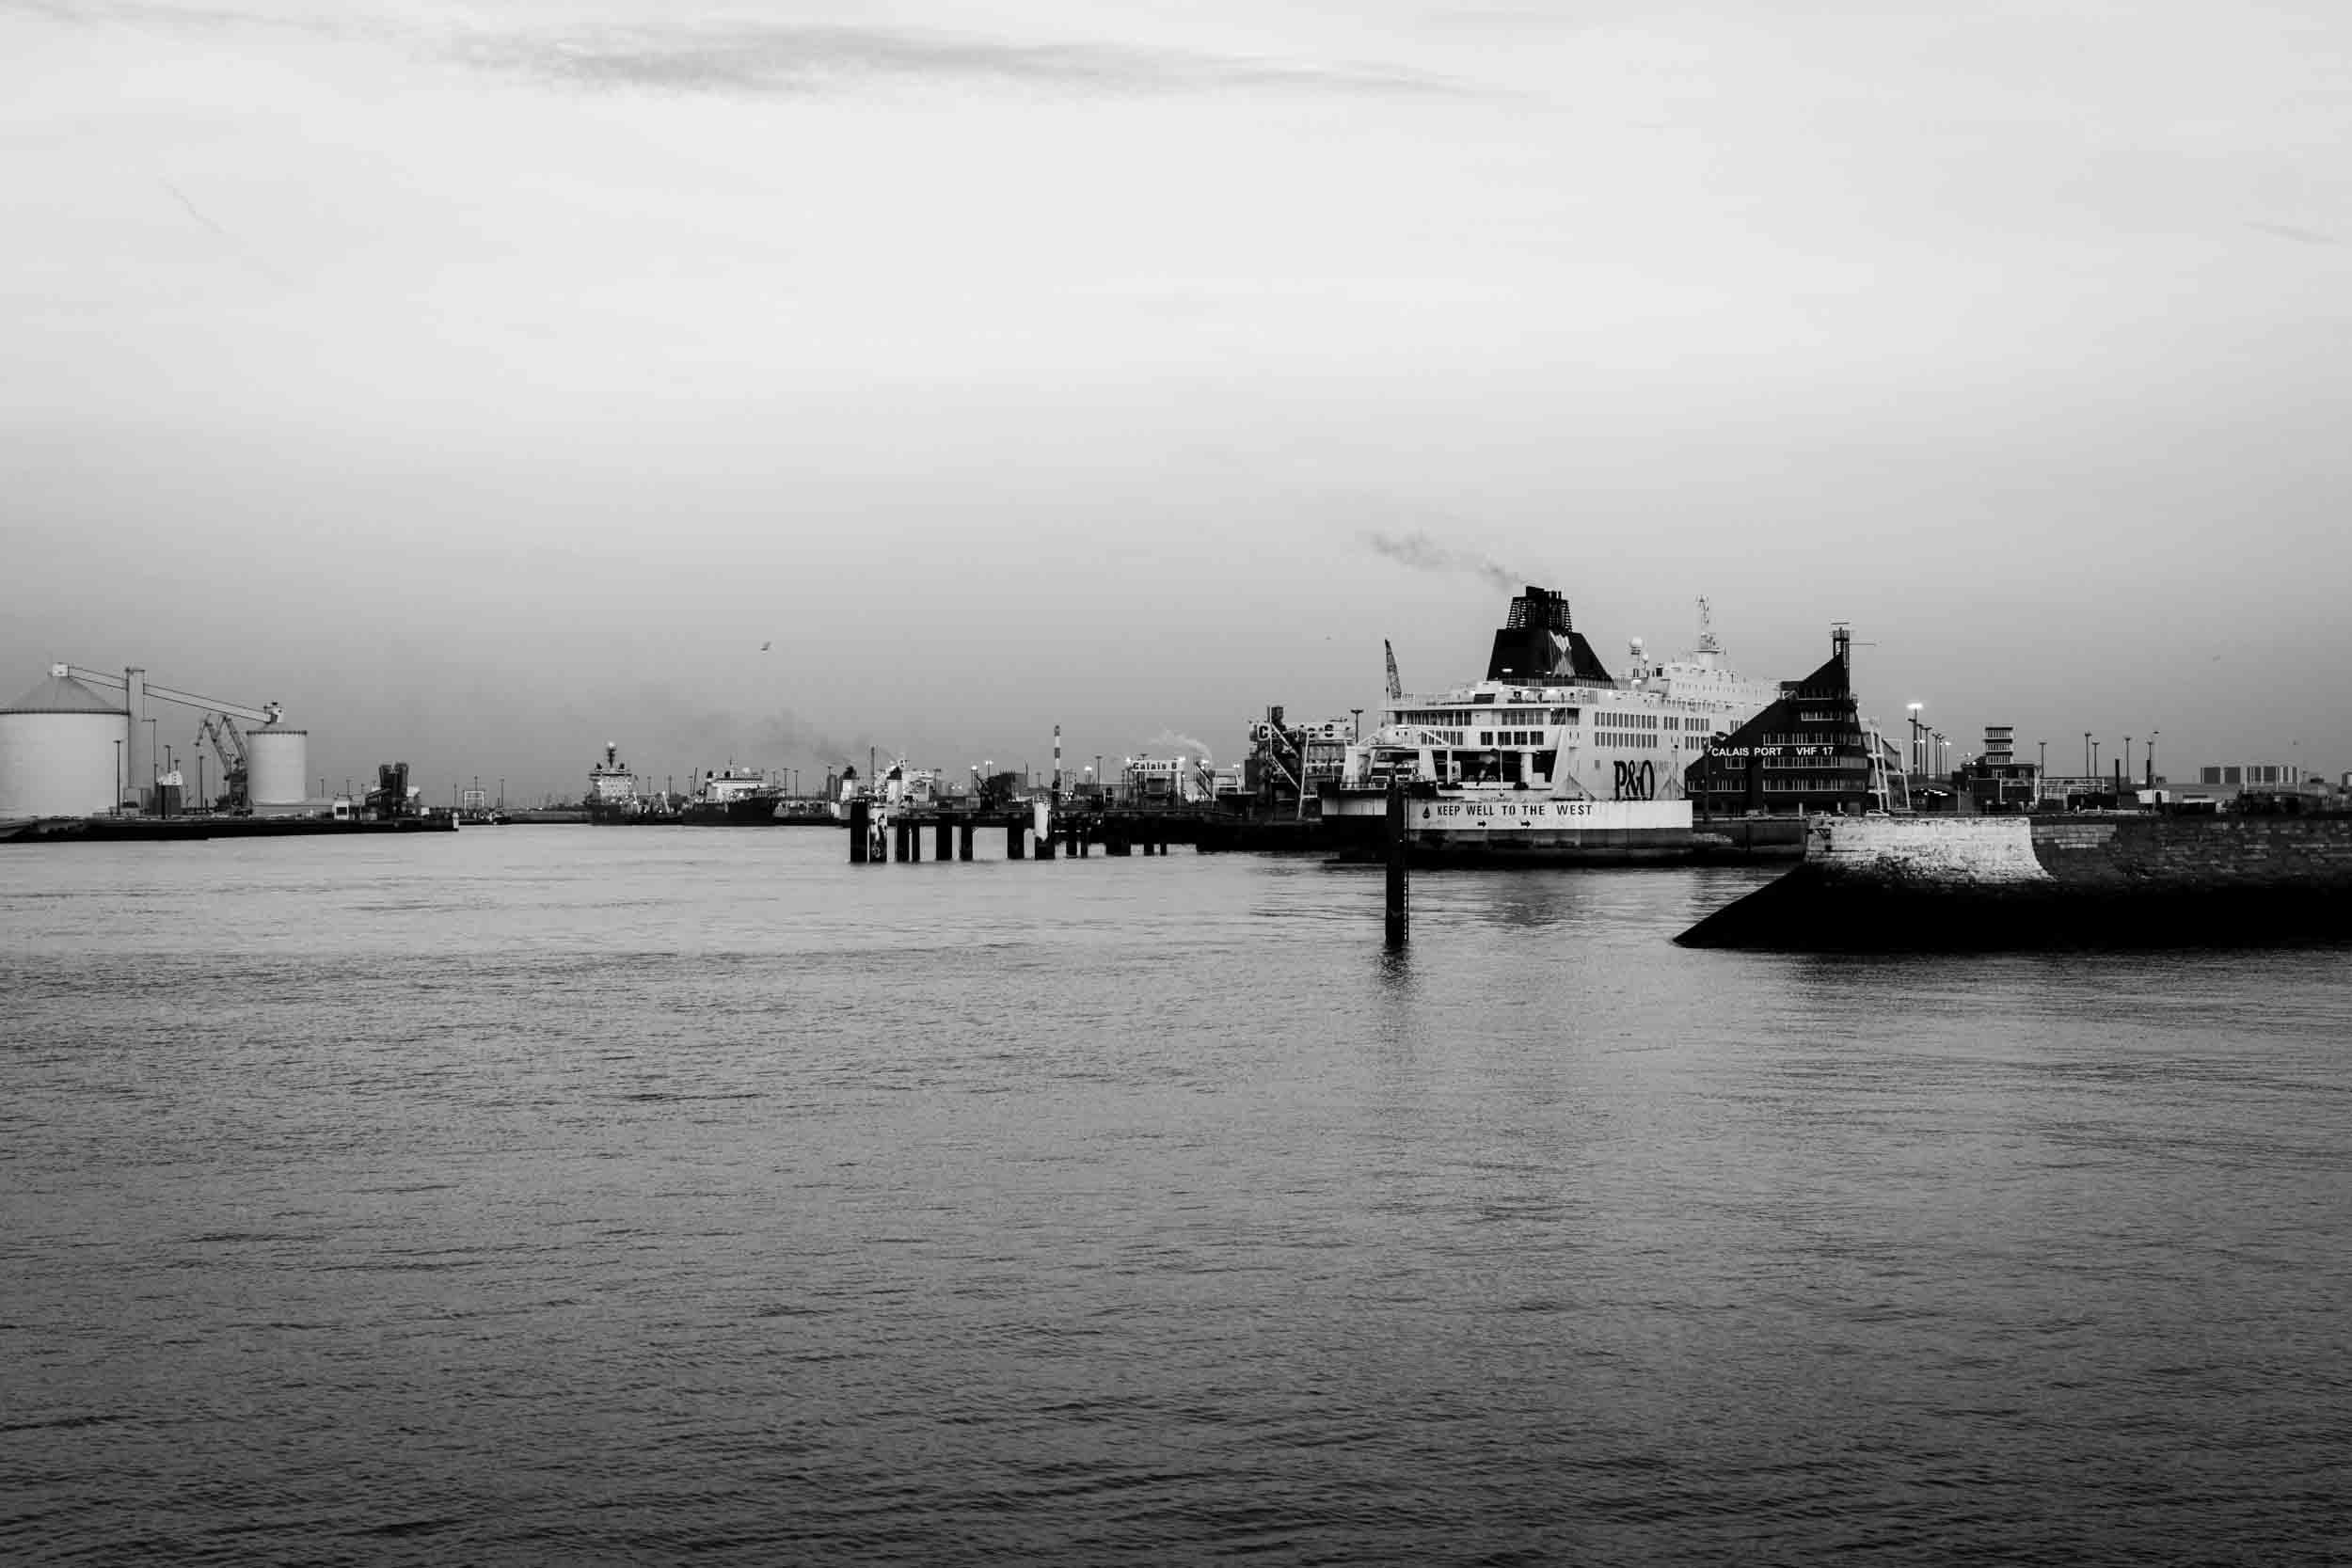 20140306_Calais__MG_0283-2